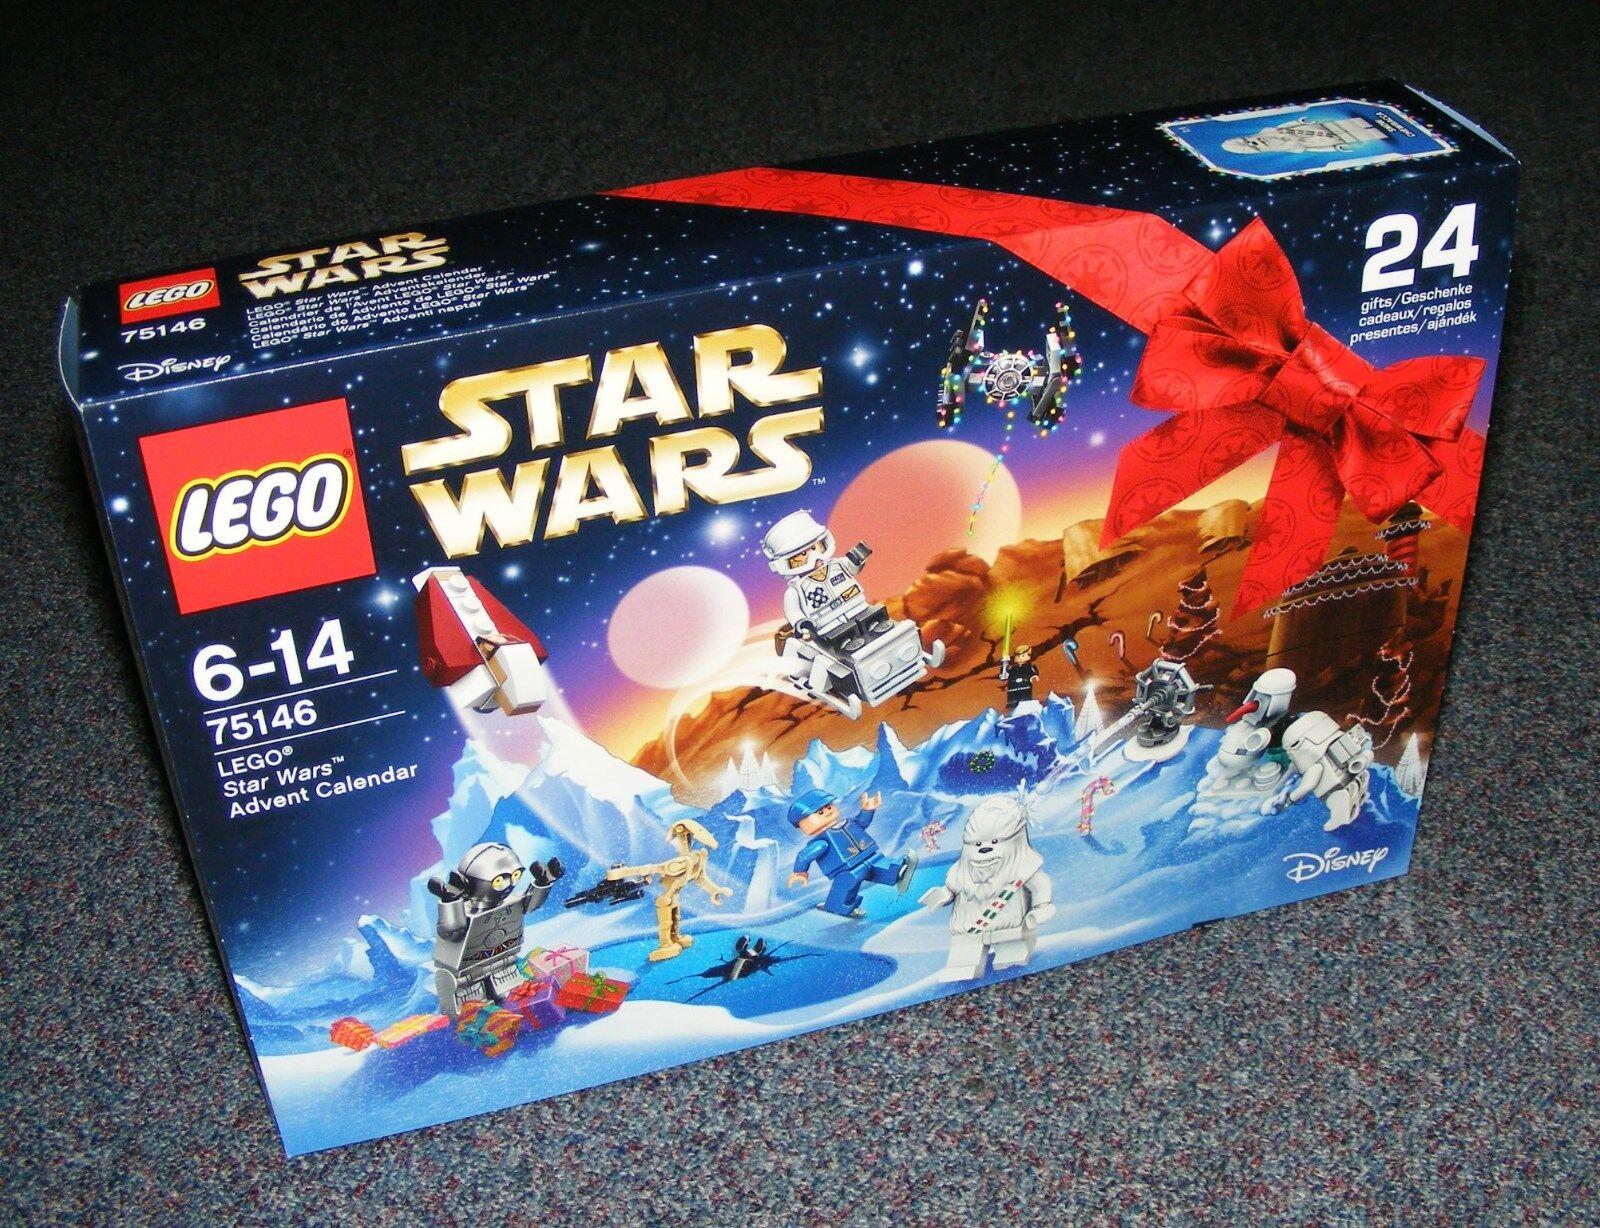 STAR WARS LEGO 75146 ADVENT CALENDAR 2016 BRAND NEW SEALED SNOW CHEWBACCA